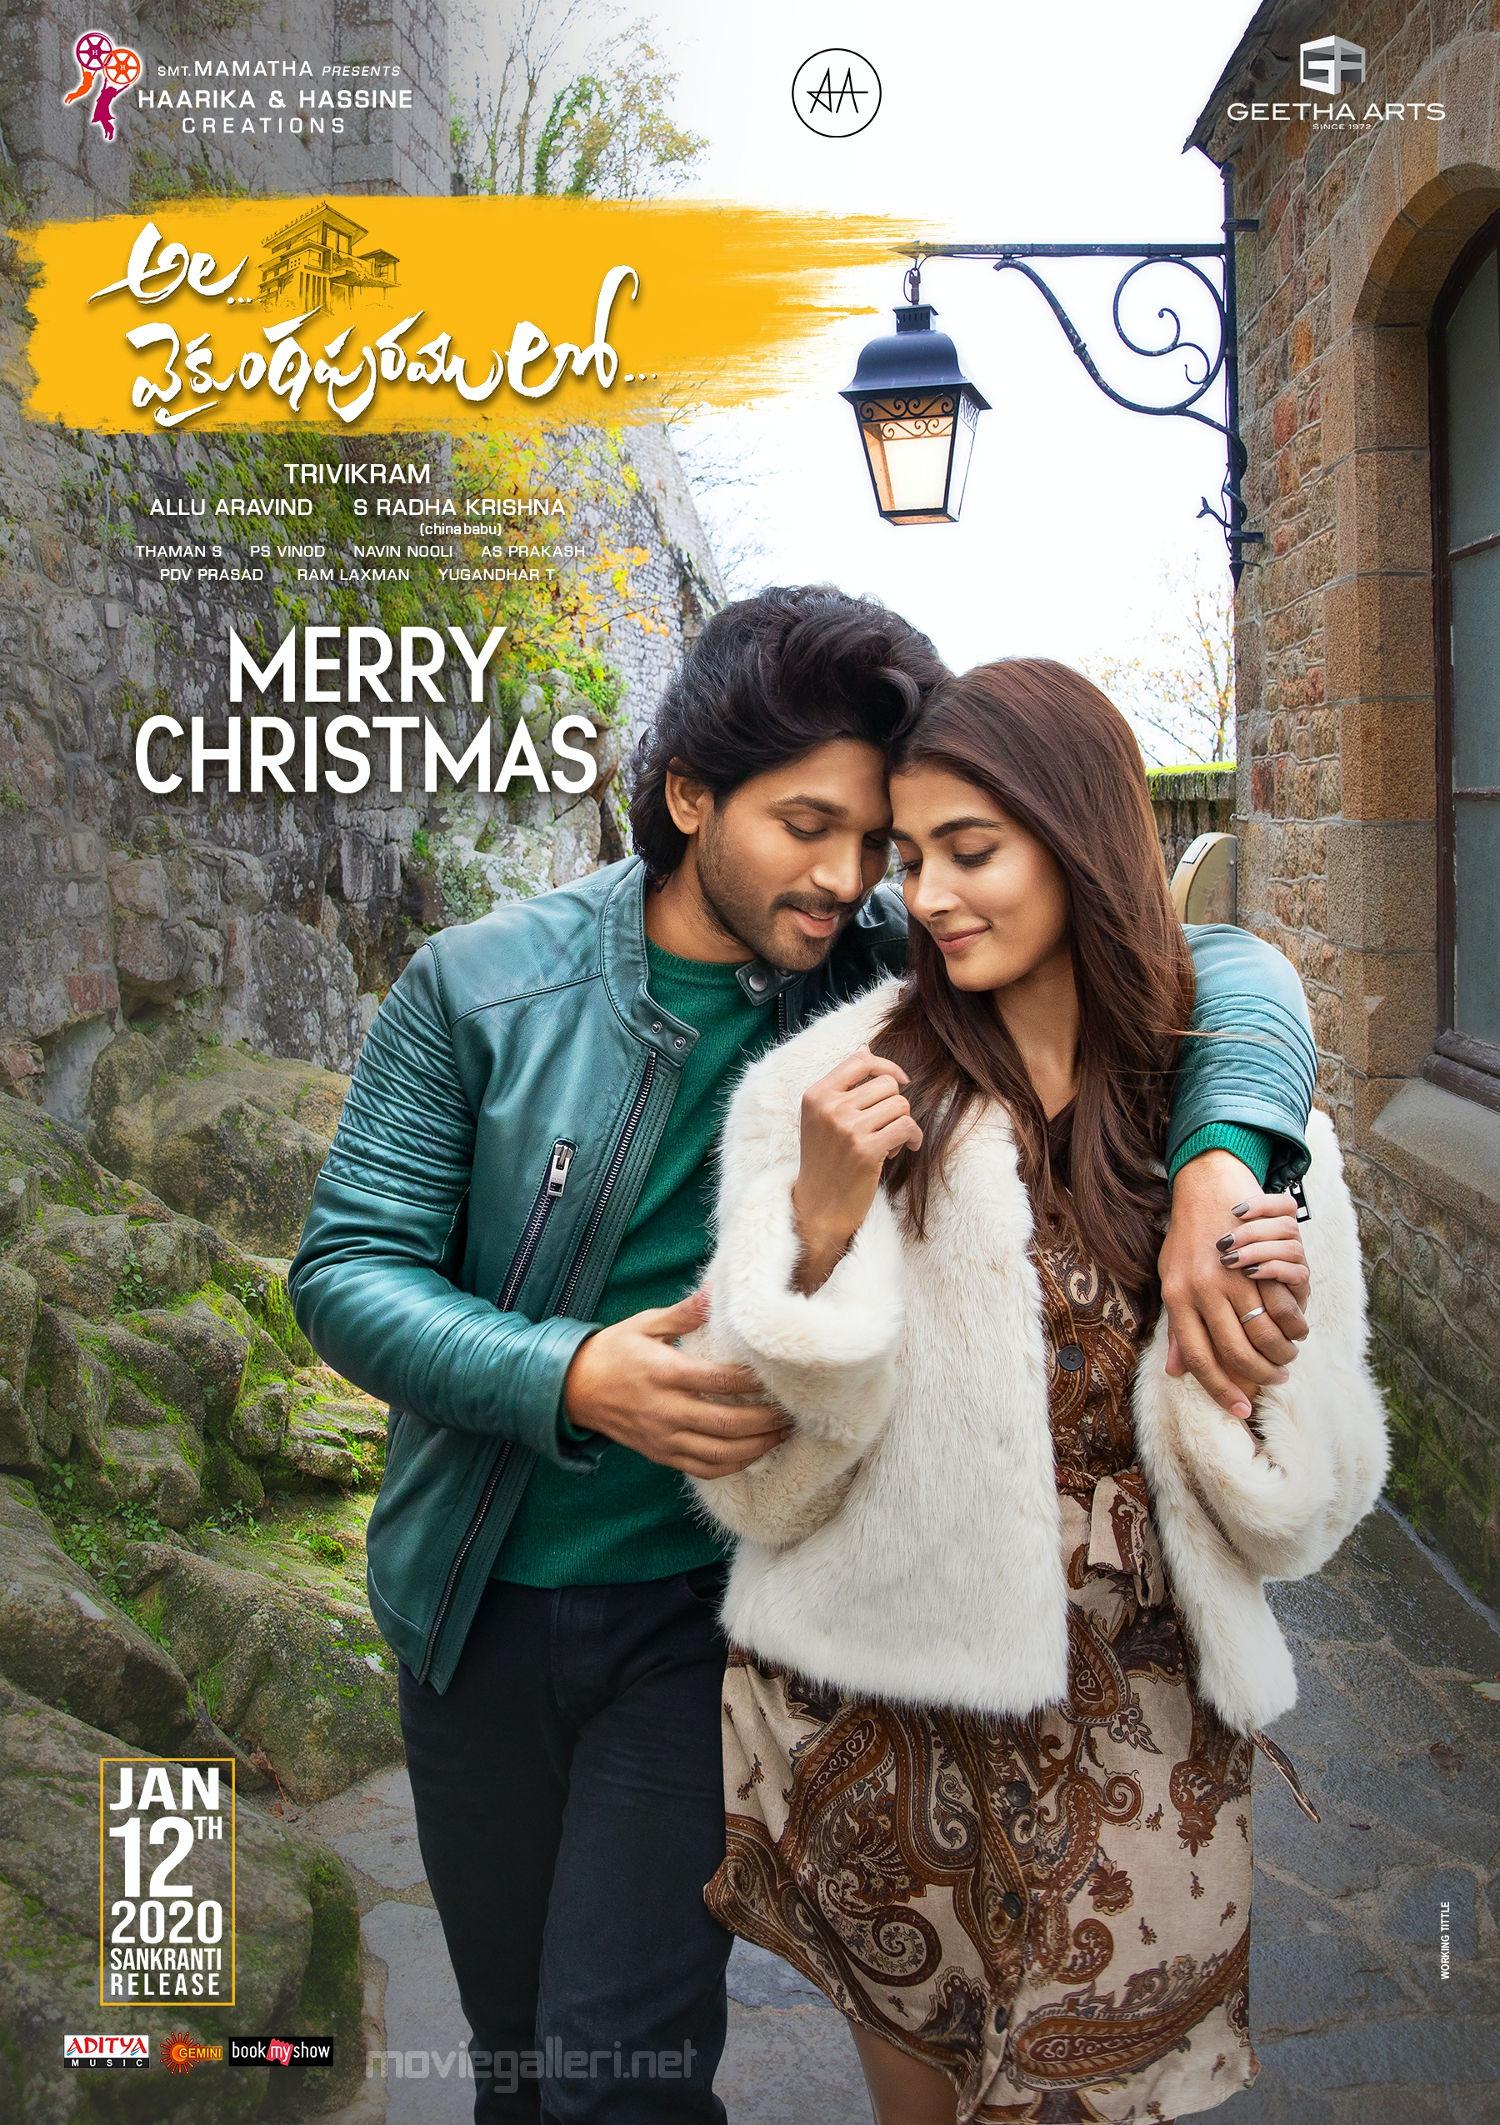 Allu Arjun Pooja Hegde Ala Vaikunthapurramloo Christmas Wishes Poster HD